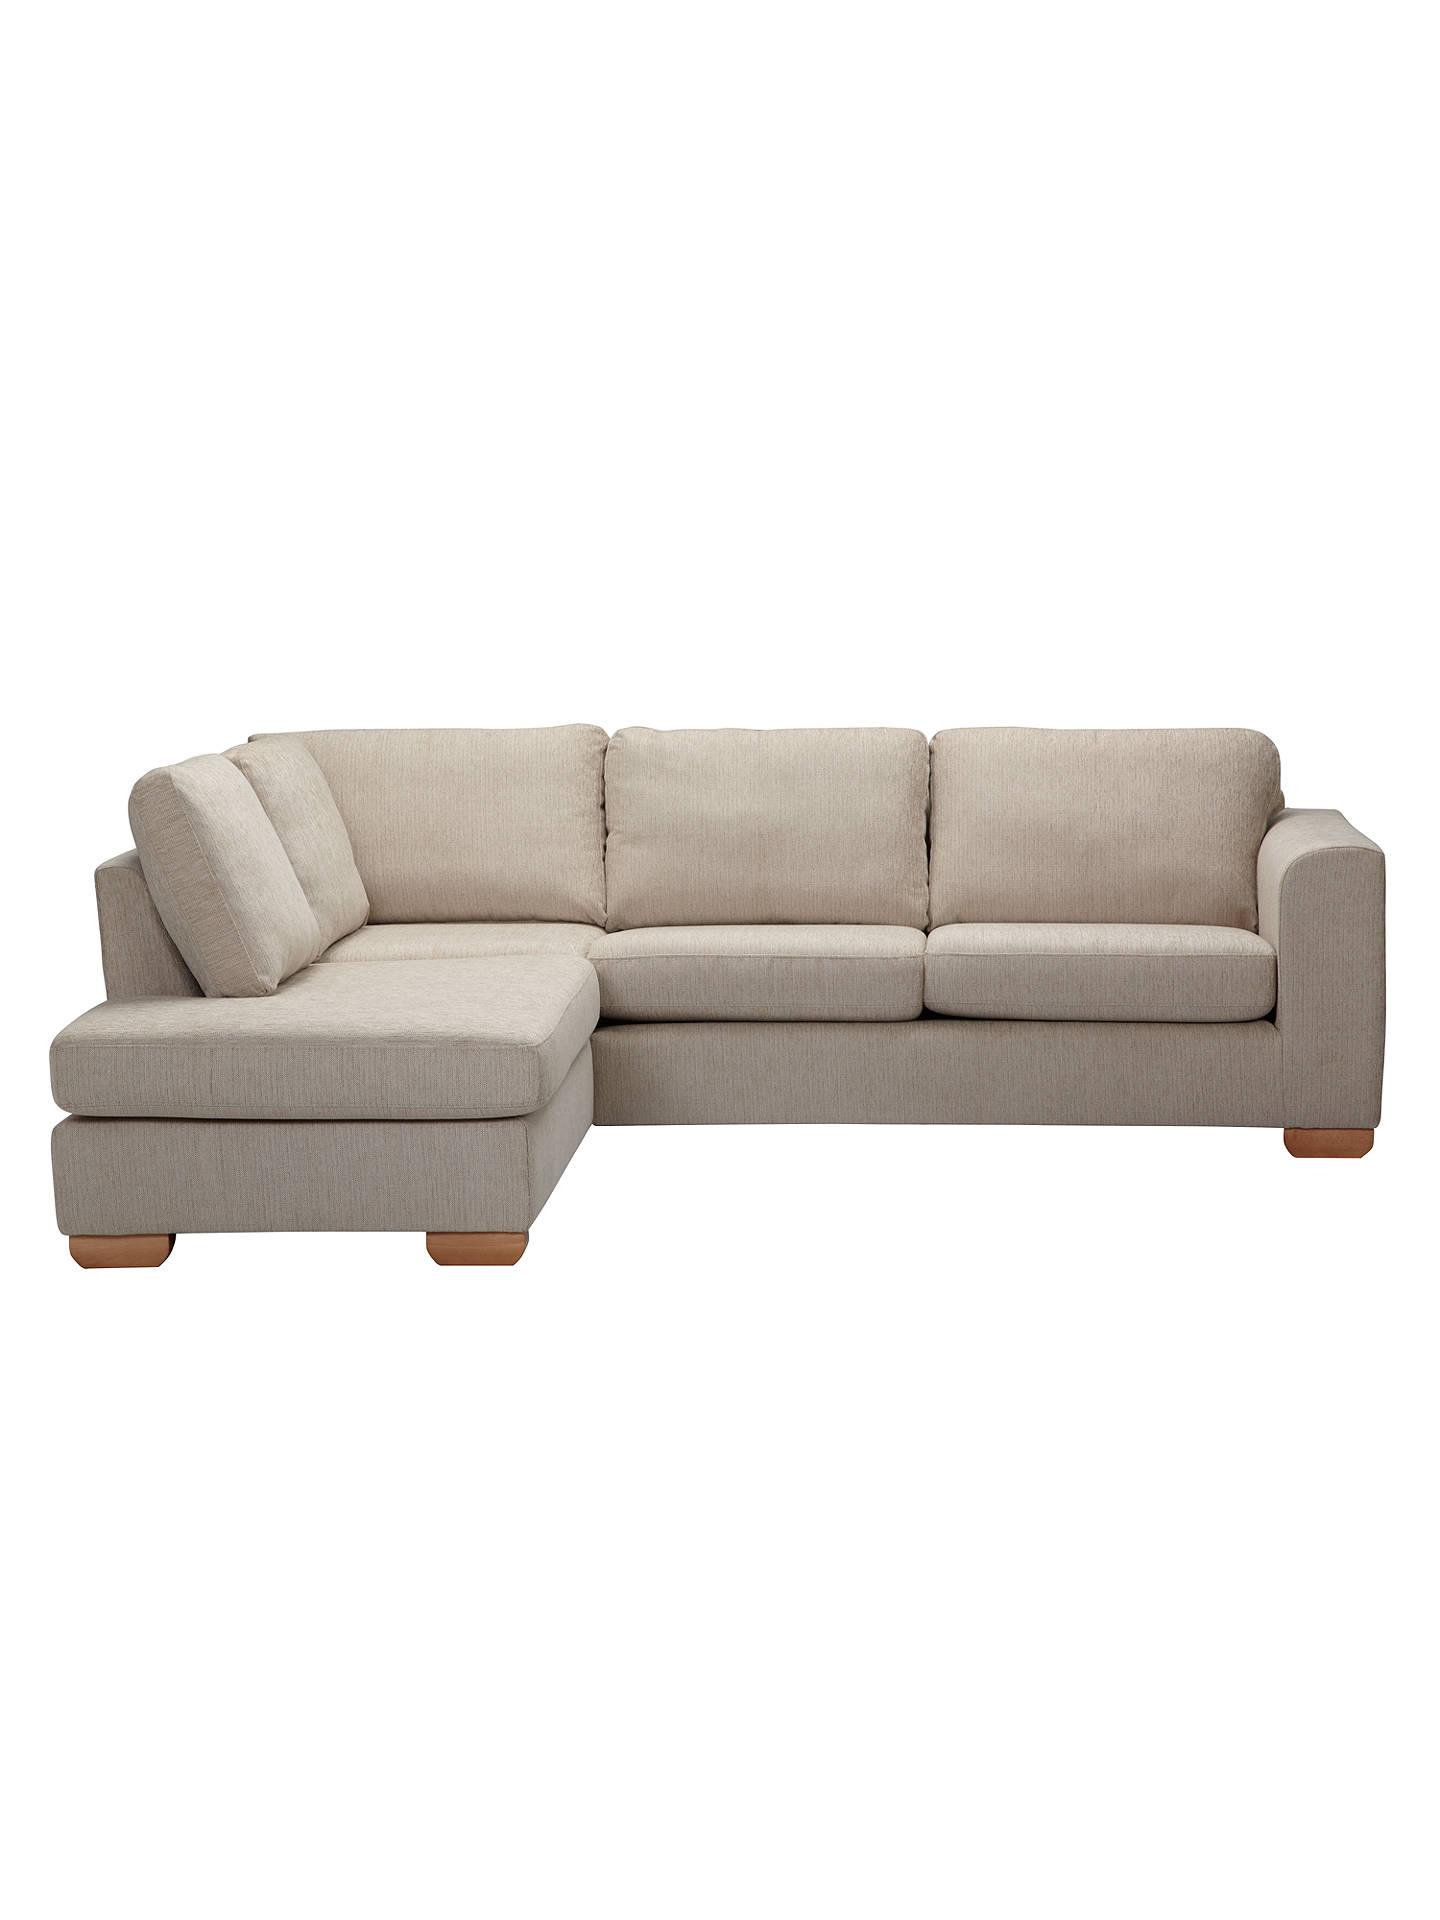 John Lewis Partners Felix Lhf Corner Chaise End Sofa With Light Legs Elena Mocha